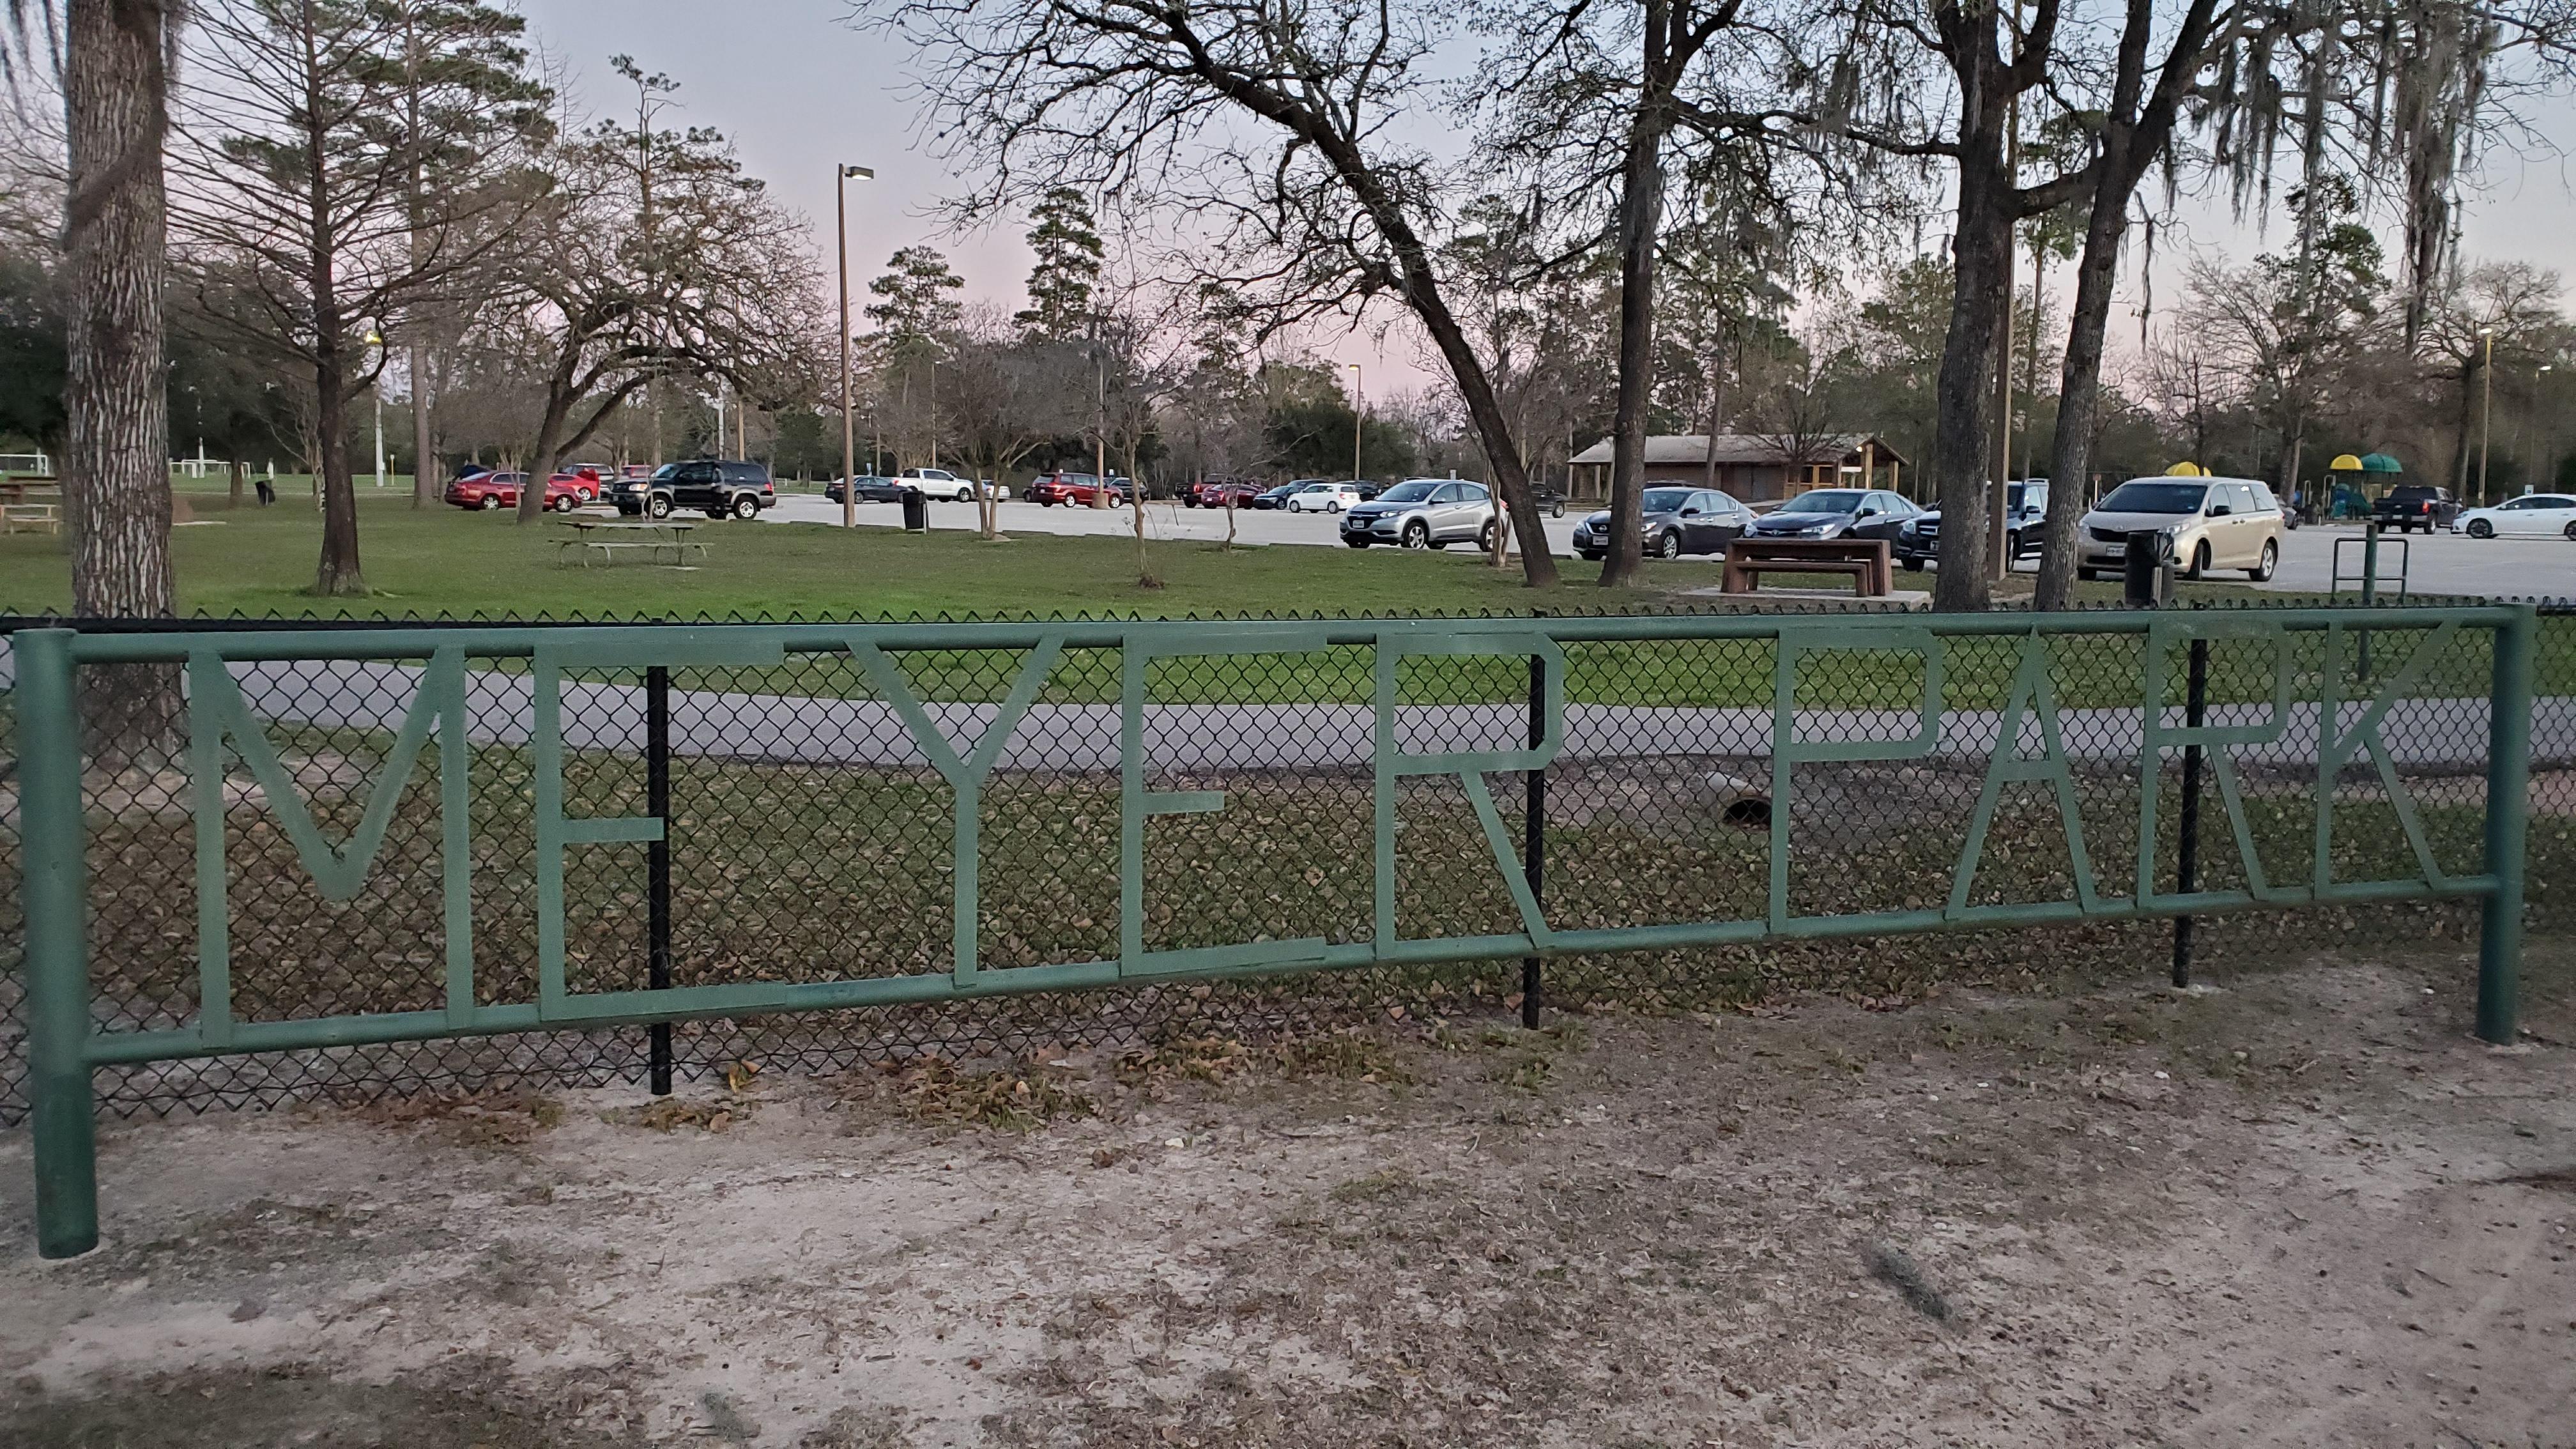 Meyer Park Running Club